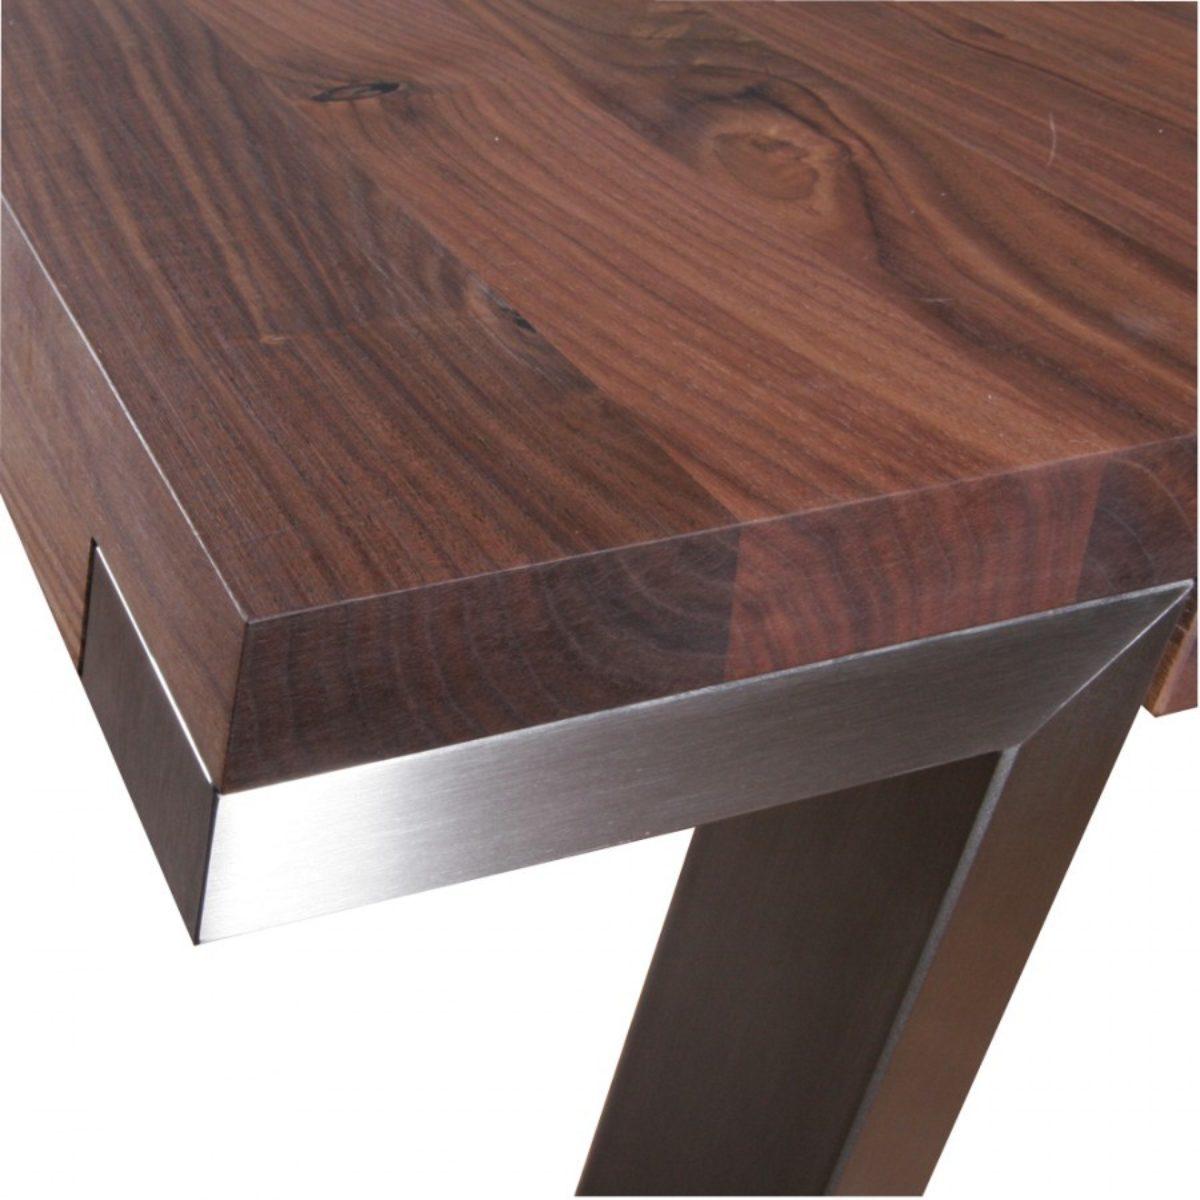 Bert plantagie tafels collectie keuze table 1